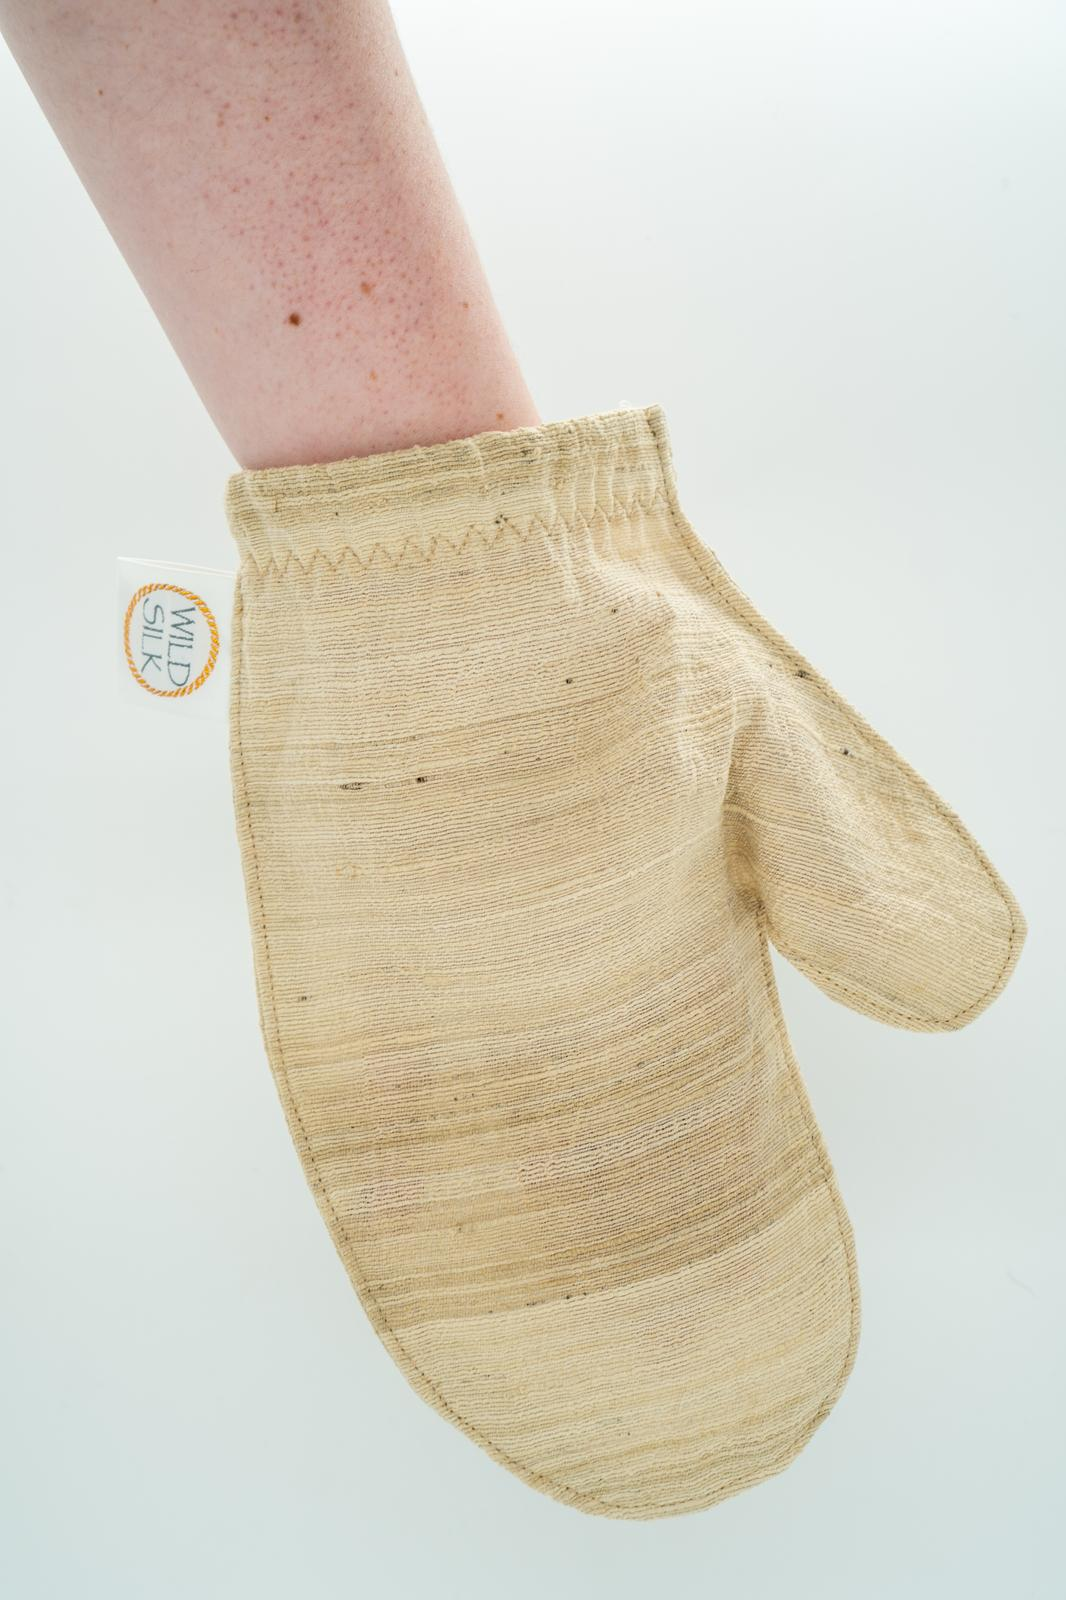 Tussah Silk Skin polishing mitts